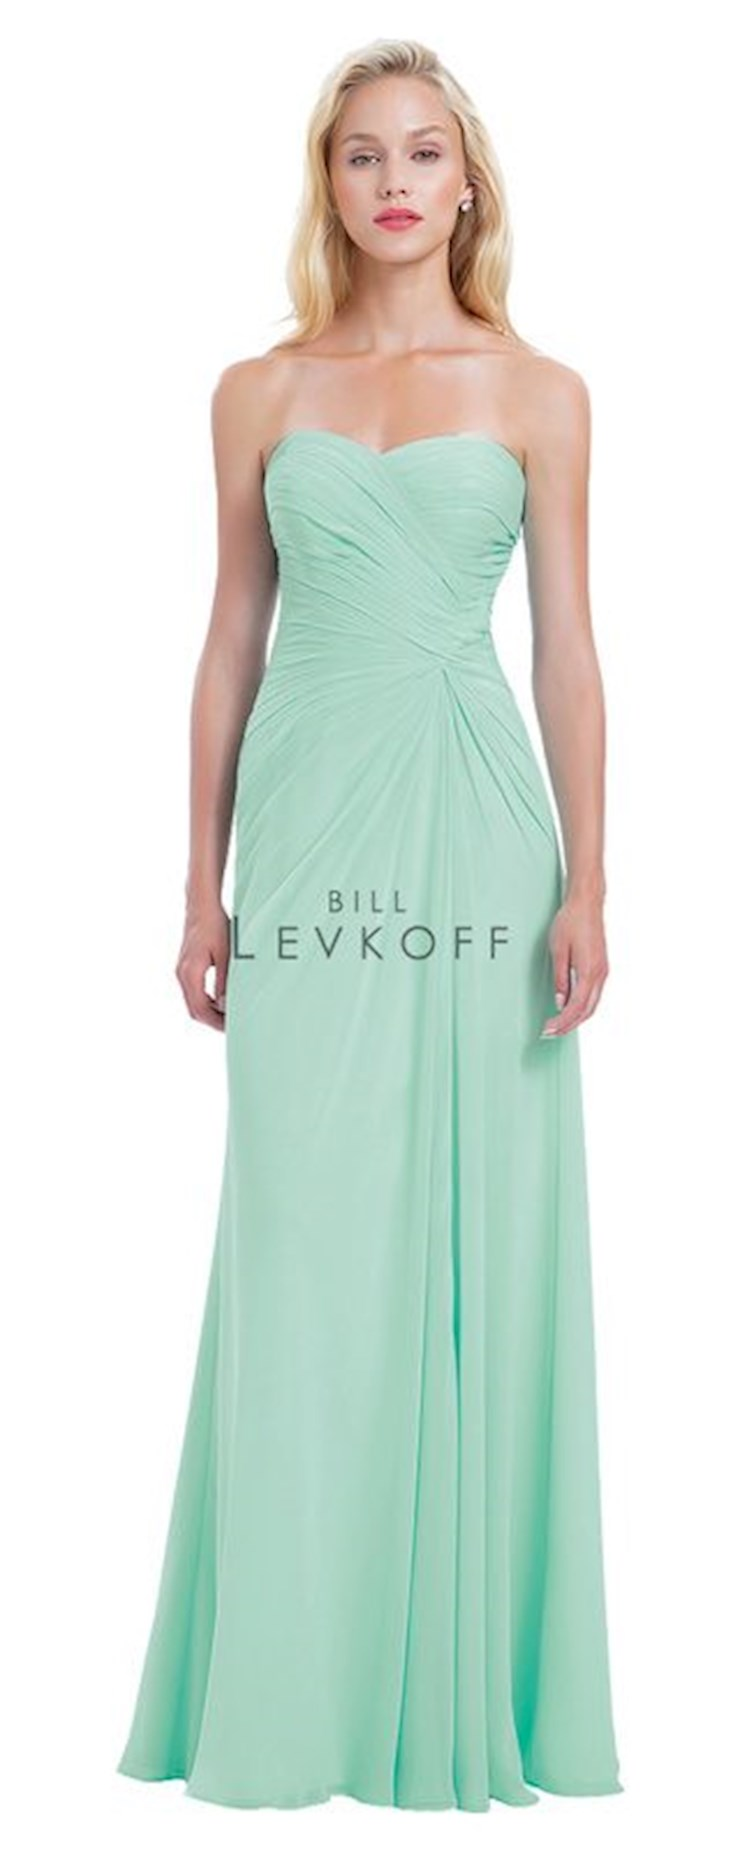 Bill Levkoff Style #1159